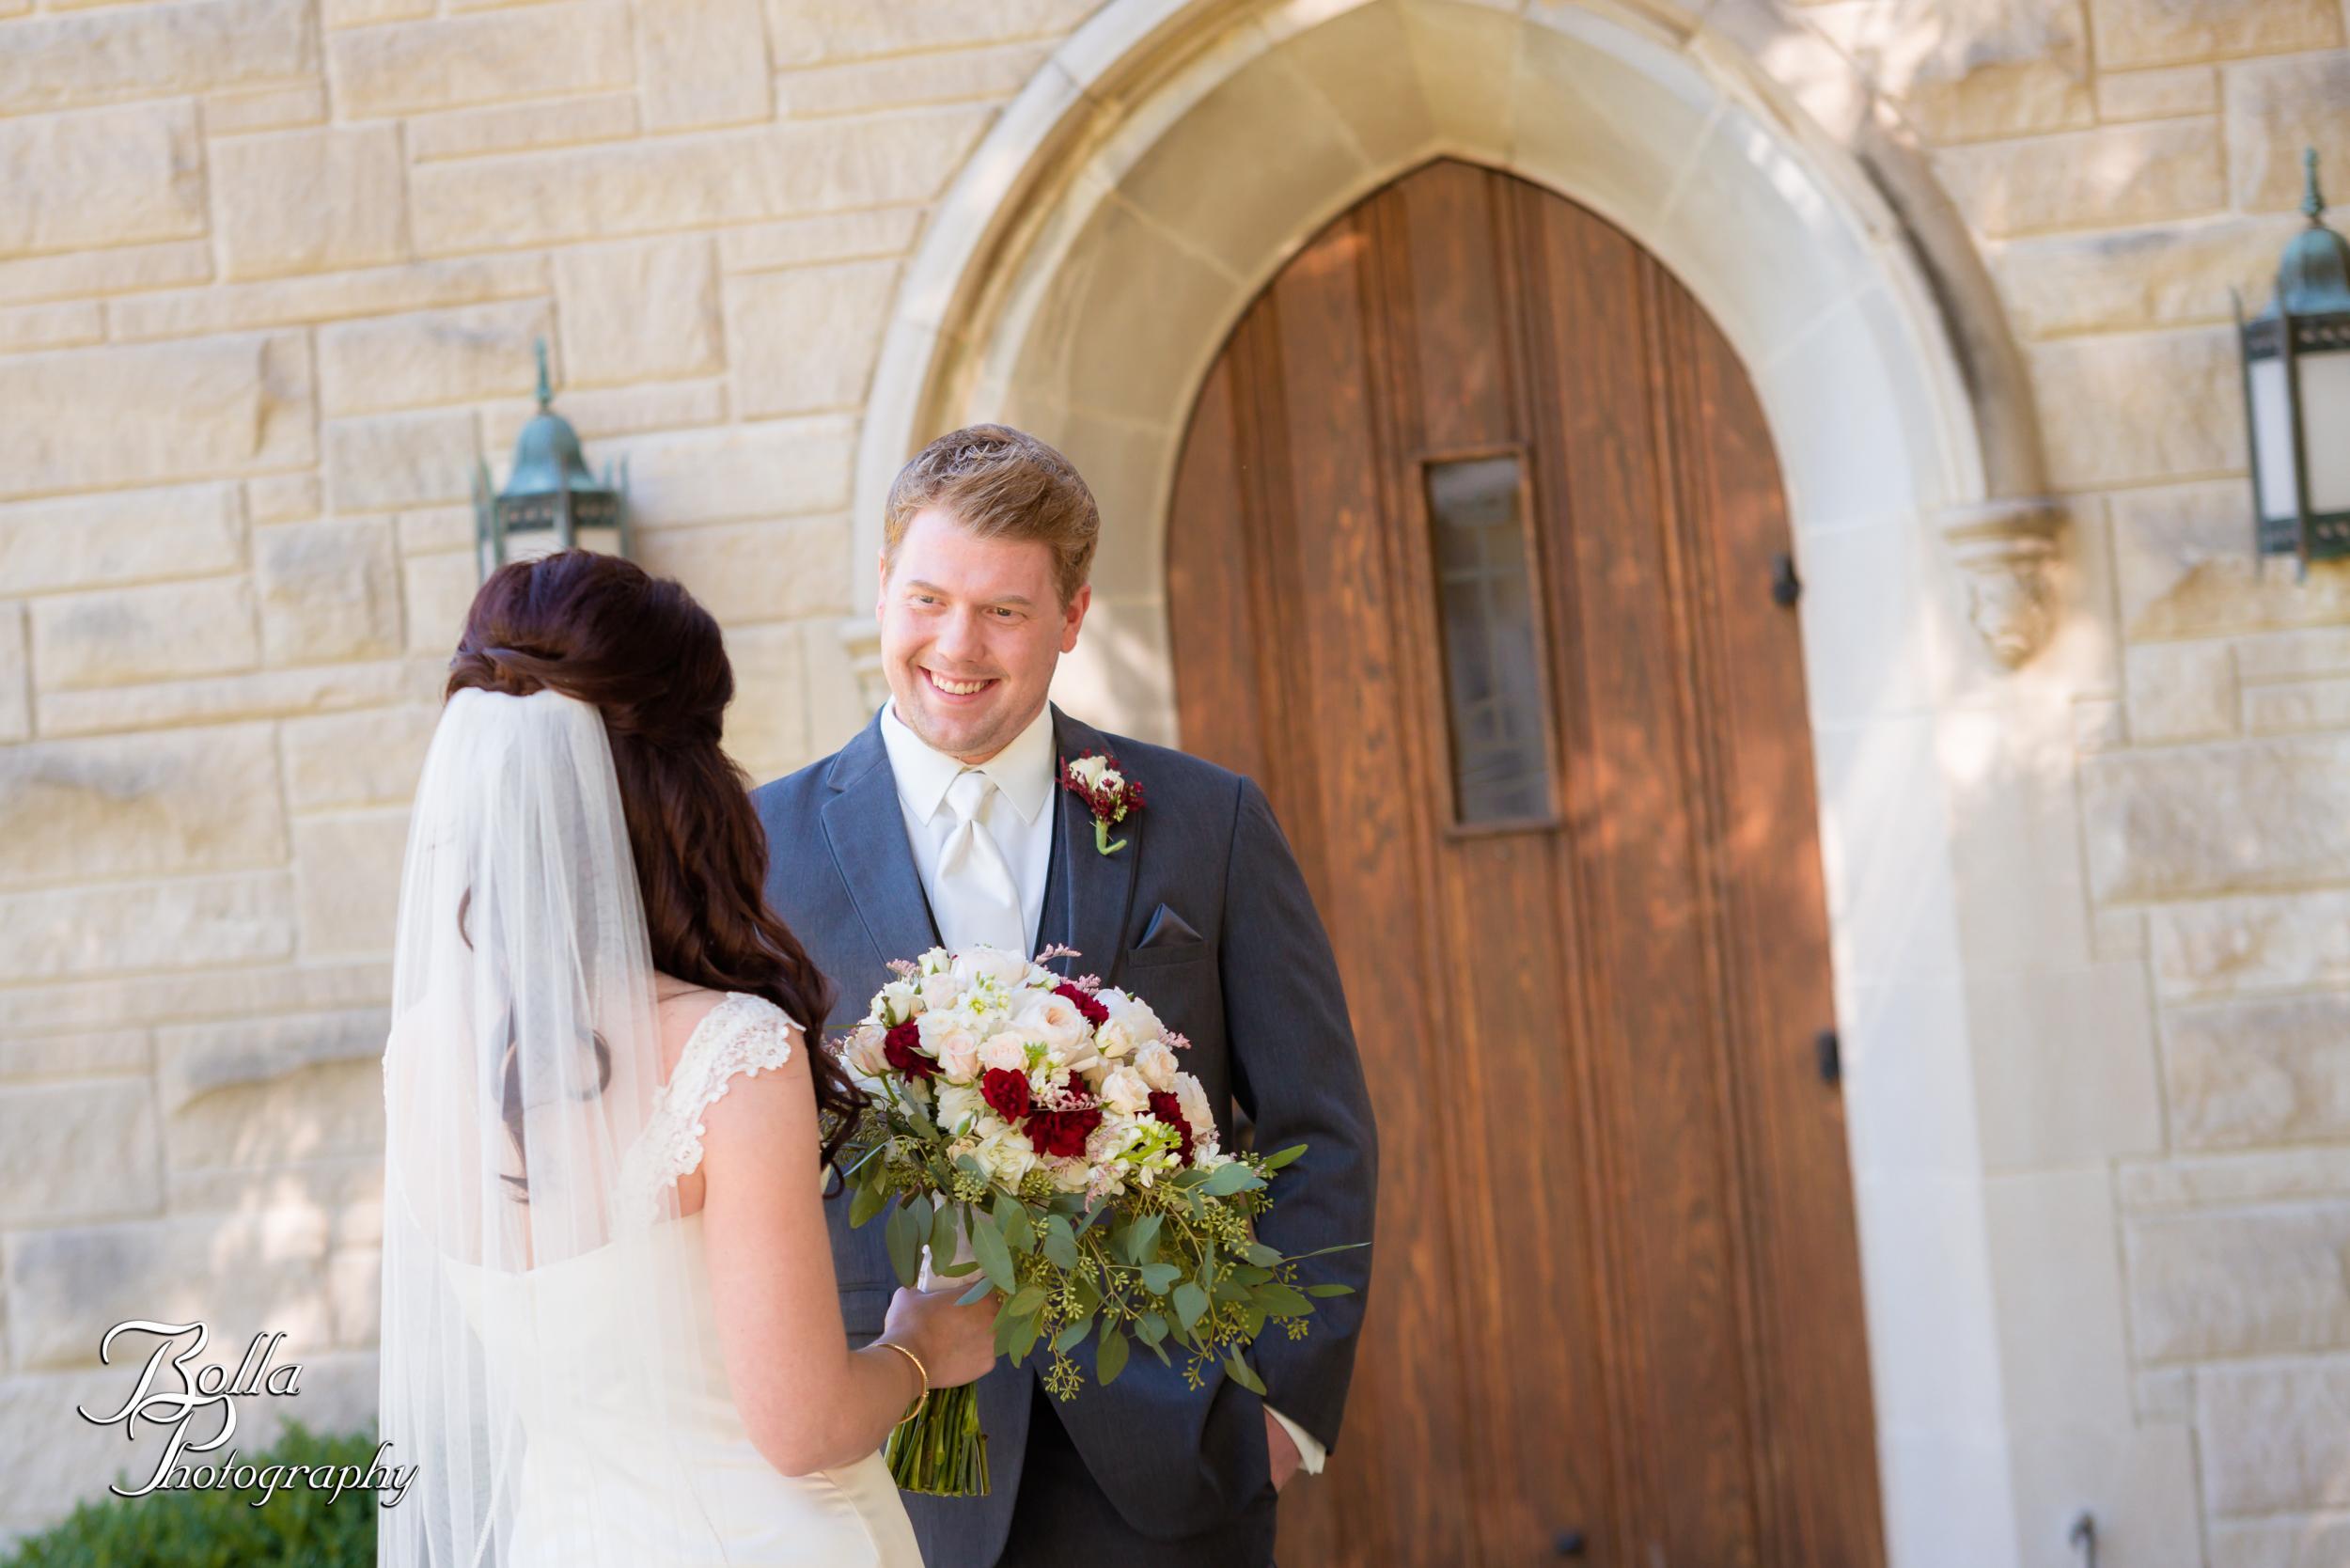 Bolla_photography_edwardsville_wedding_photographer_st_louis_weddings_Reilmann-0078.jpg